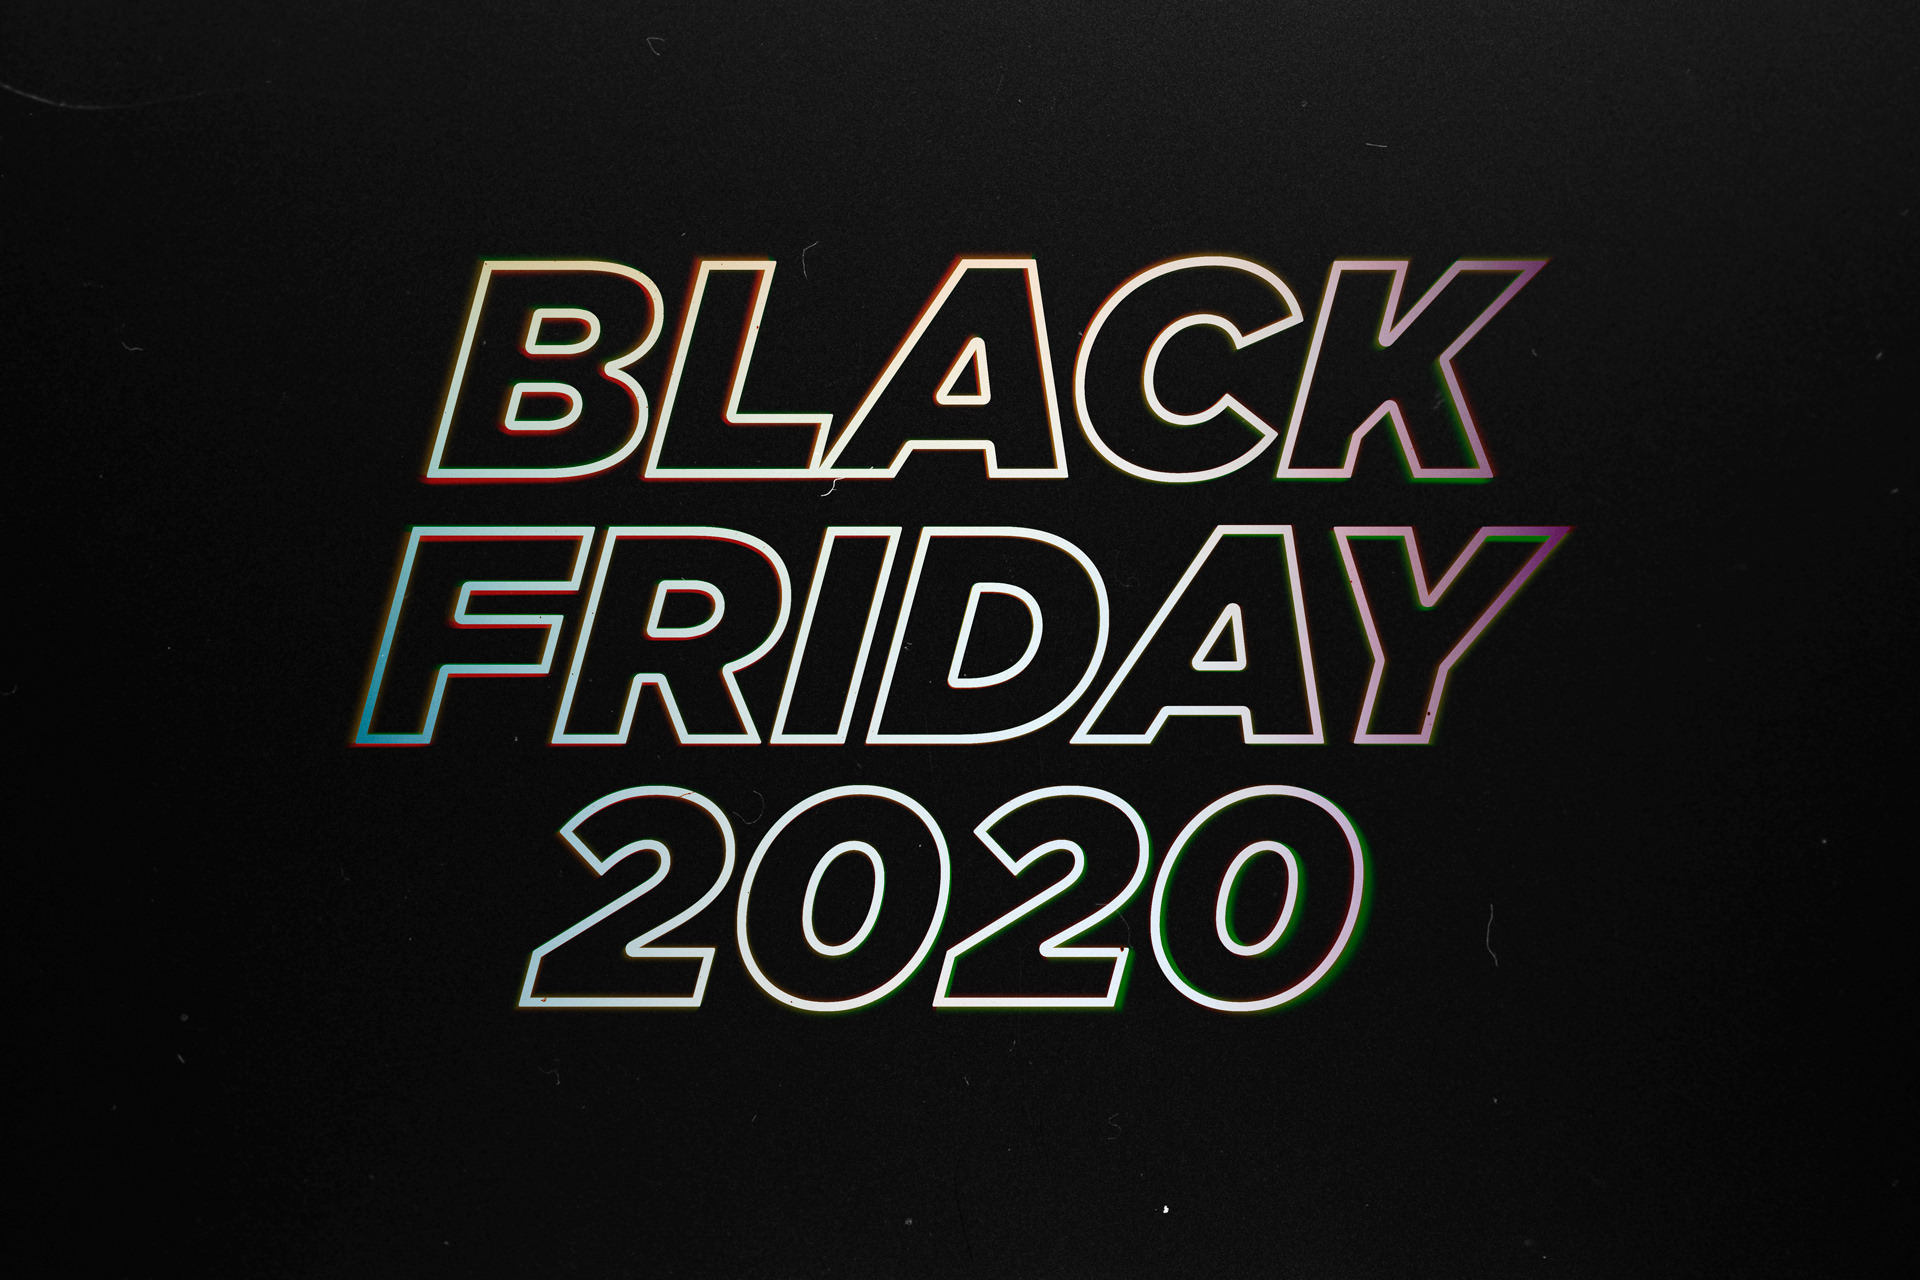 Fotografie Deals am Black Friday 2020